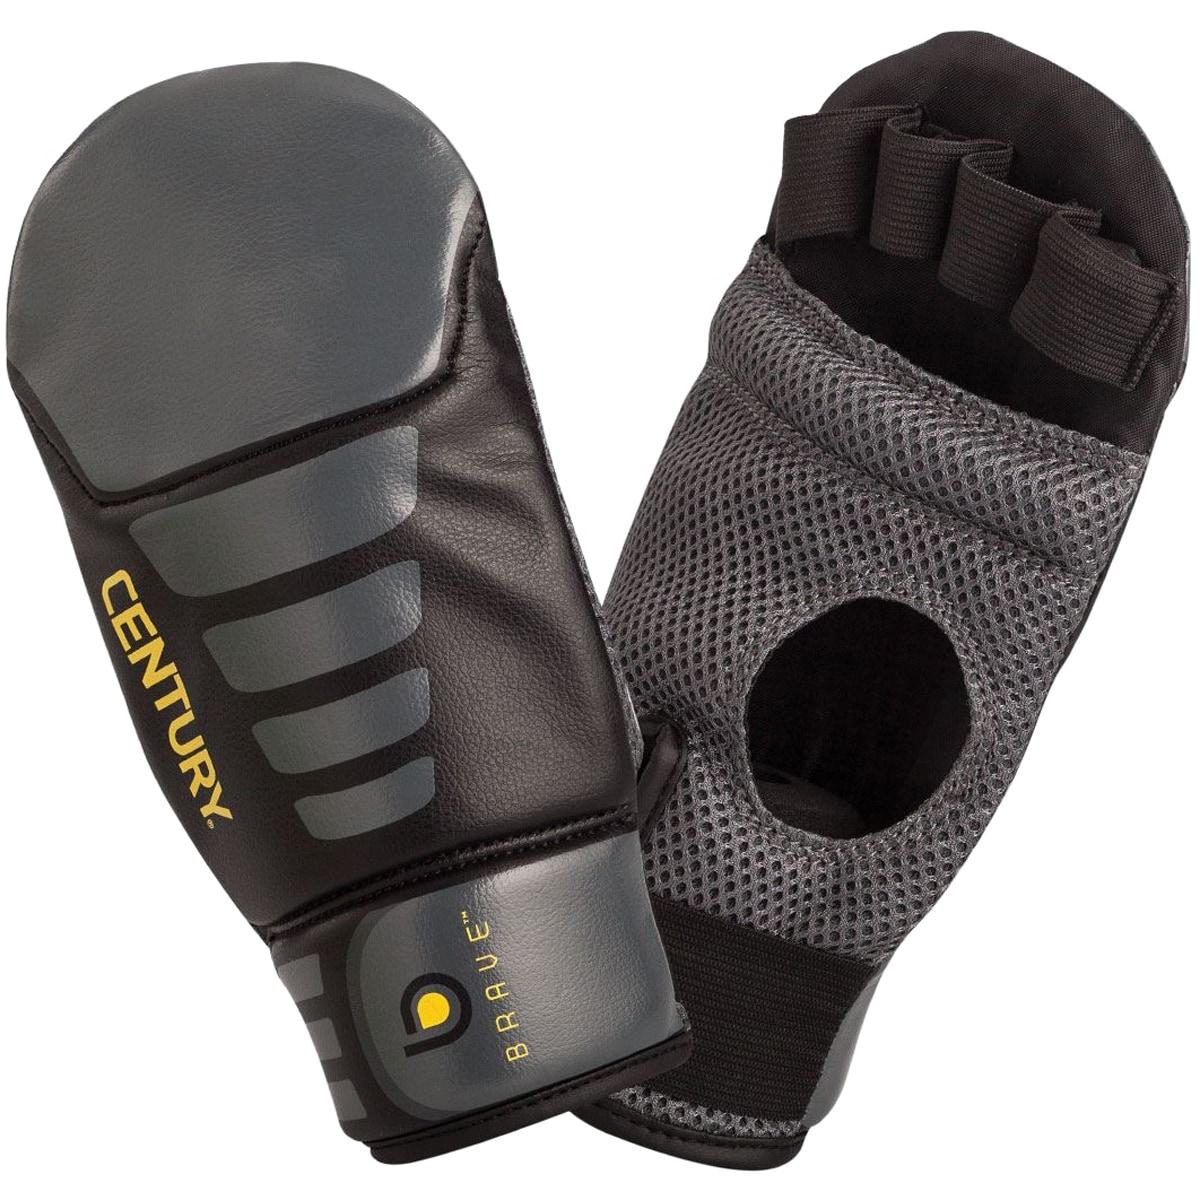 boxing MMA heavy training Century Brave Lightweight Slip-On Speed Bag Gloves